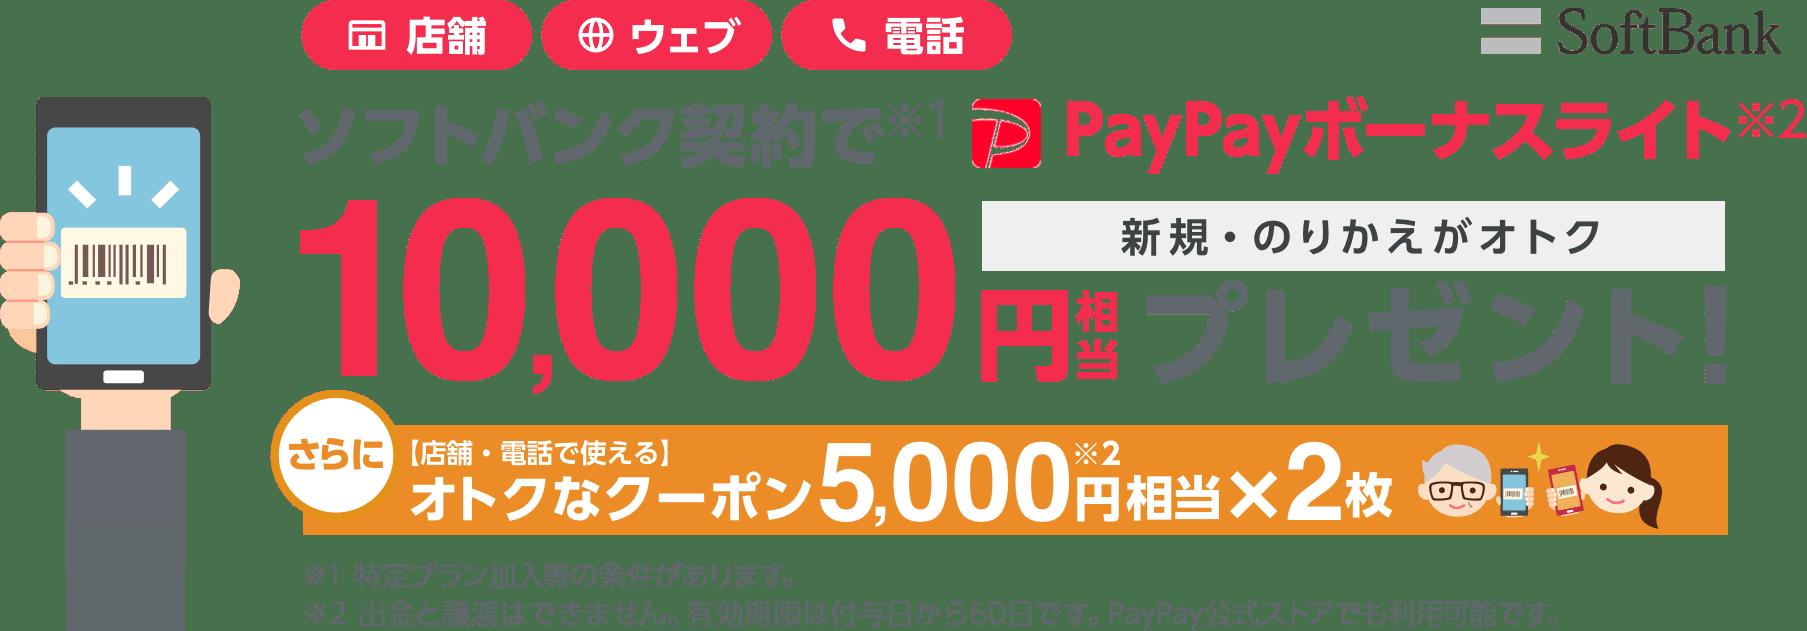 SoftBank 店舗・ウェブ・電話で使えるクーポン配布中 ソフトバンク契約で(※1)PayPayボーナスライト(※2)10,000円相当プレゼント! 新規・のりかえがオトク さらに【店舗・電話で使える】オトクなクーポン5,000円相当(※2)×2枚 ※1特定プラン加入等の条件があります。※2出金と譲渡はできません。有効期限は付与日から60日です。PayPay公式ストアでも利用可能です。